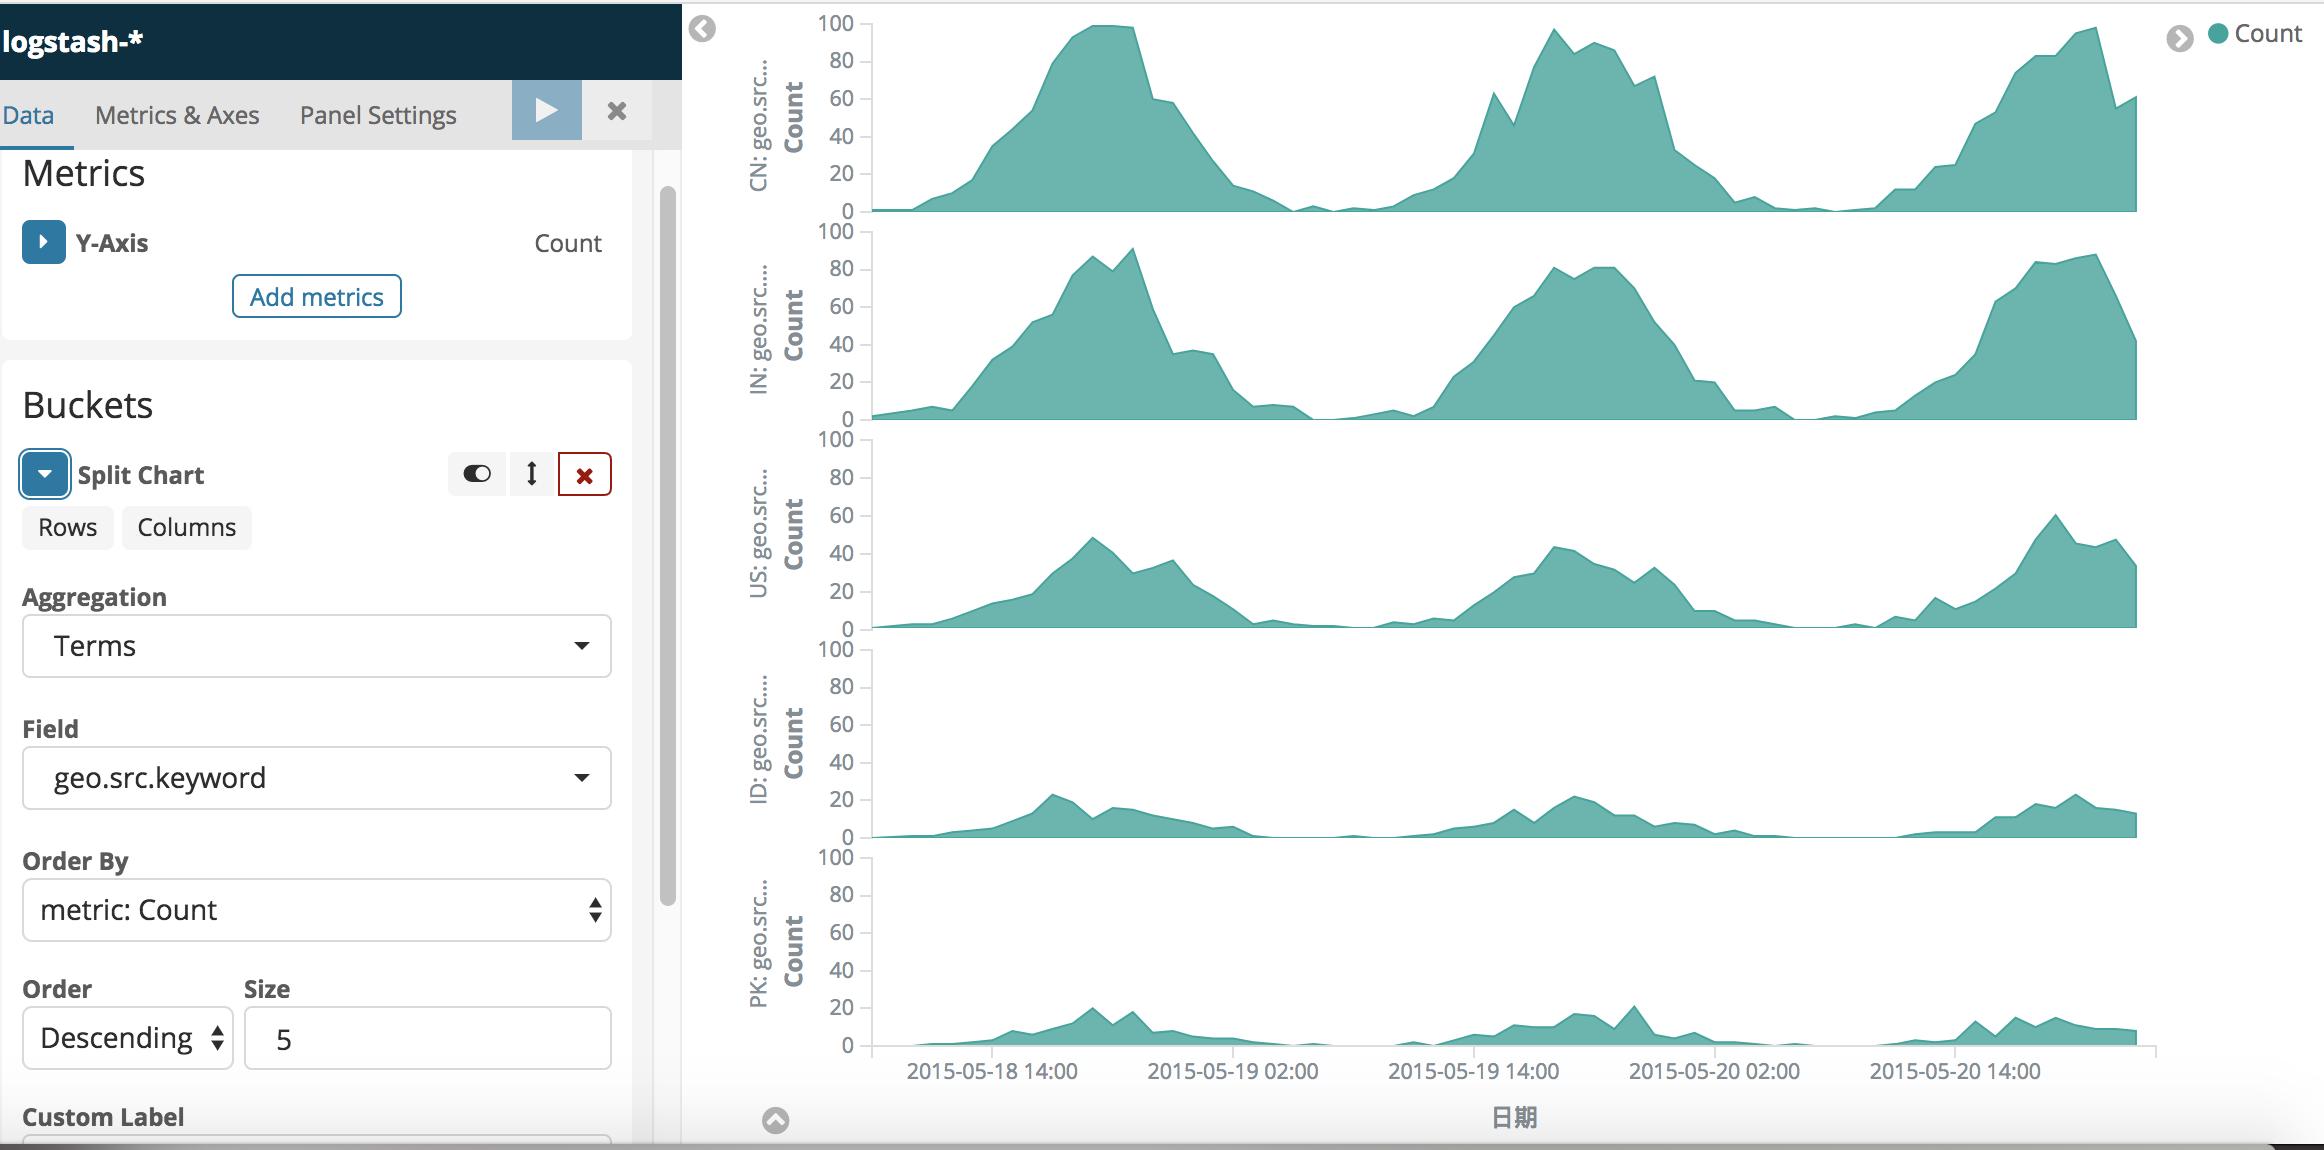 Buckets-SplitCharts使用不同的图表展示不同的数据